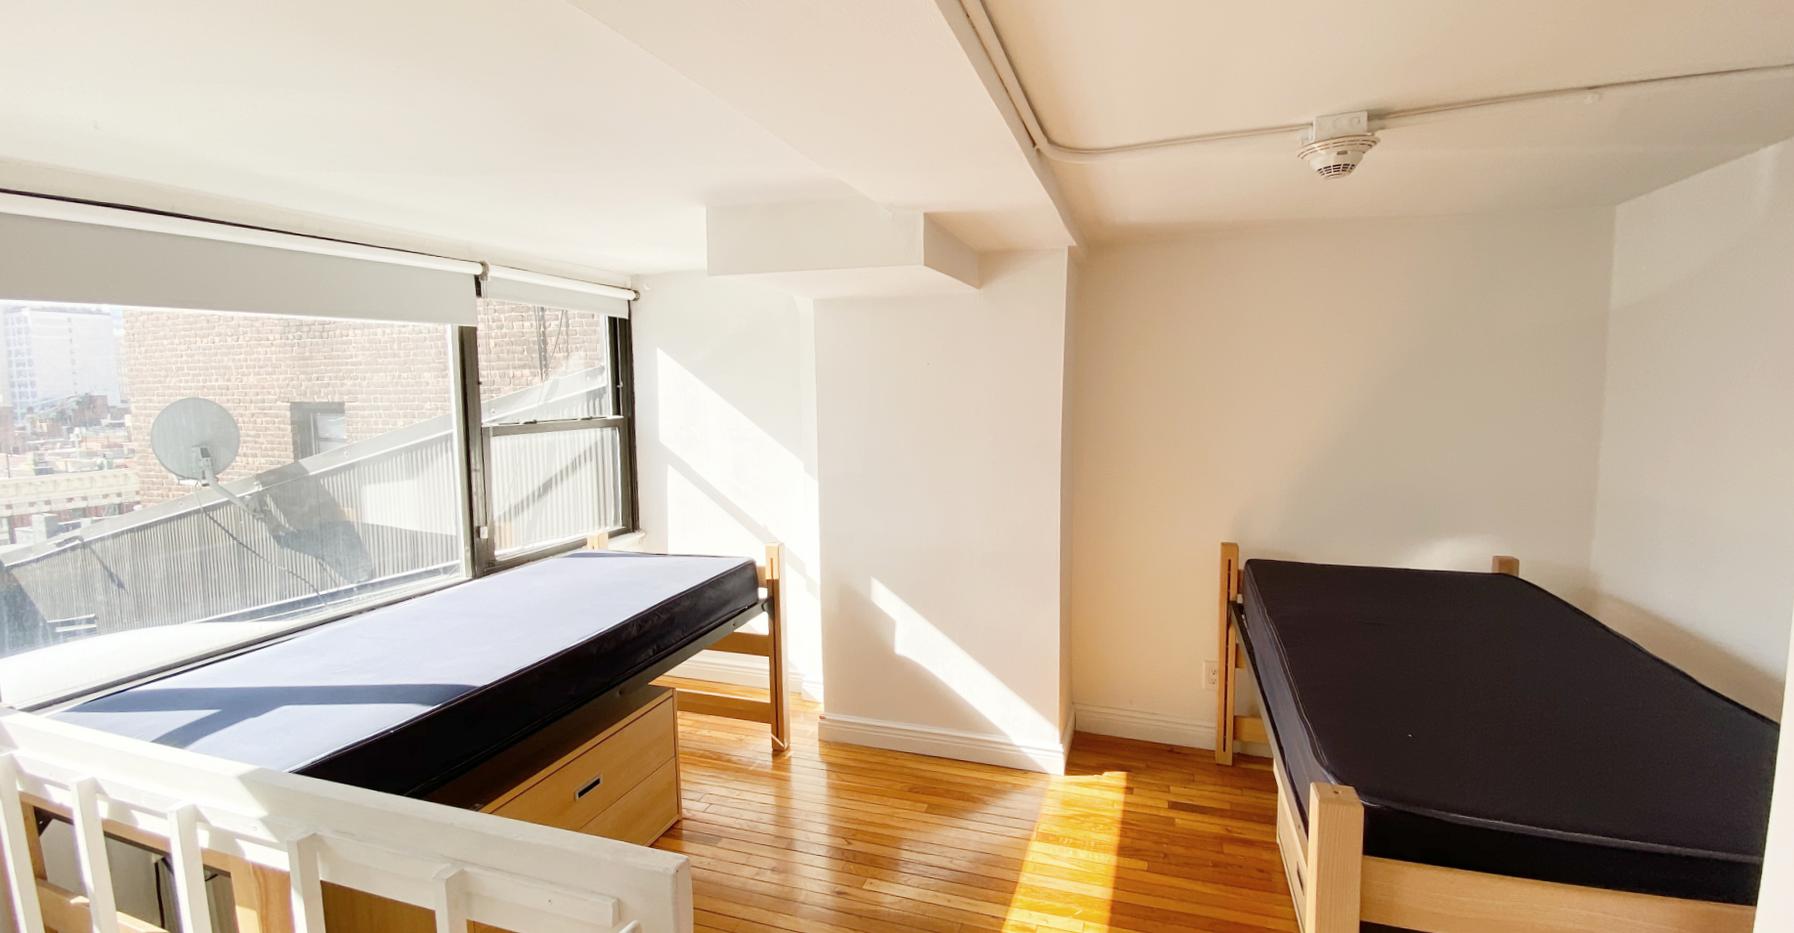 New York student housing room 4